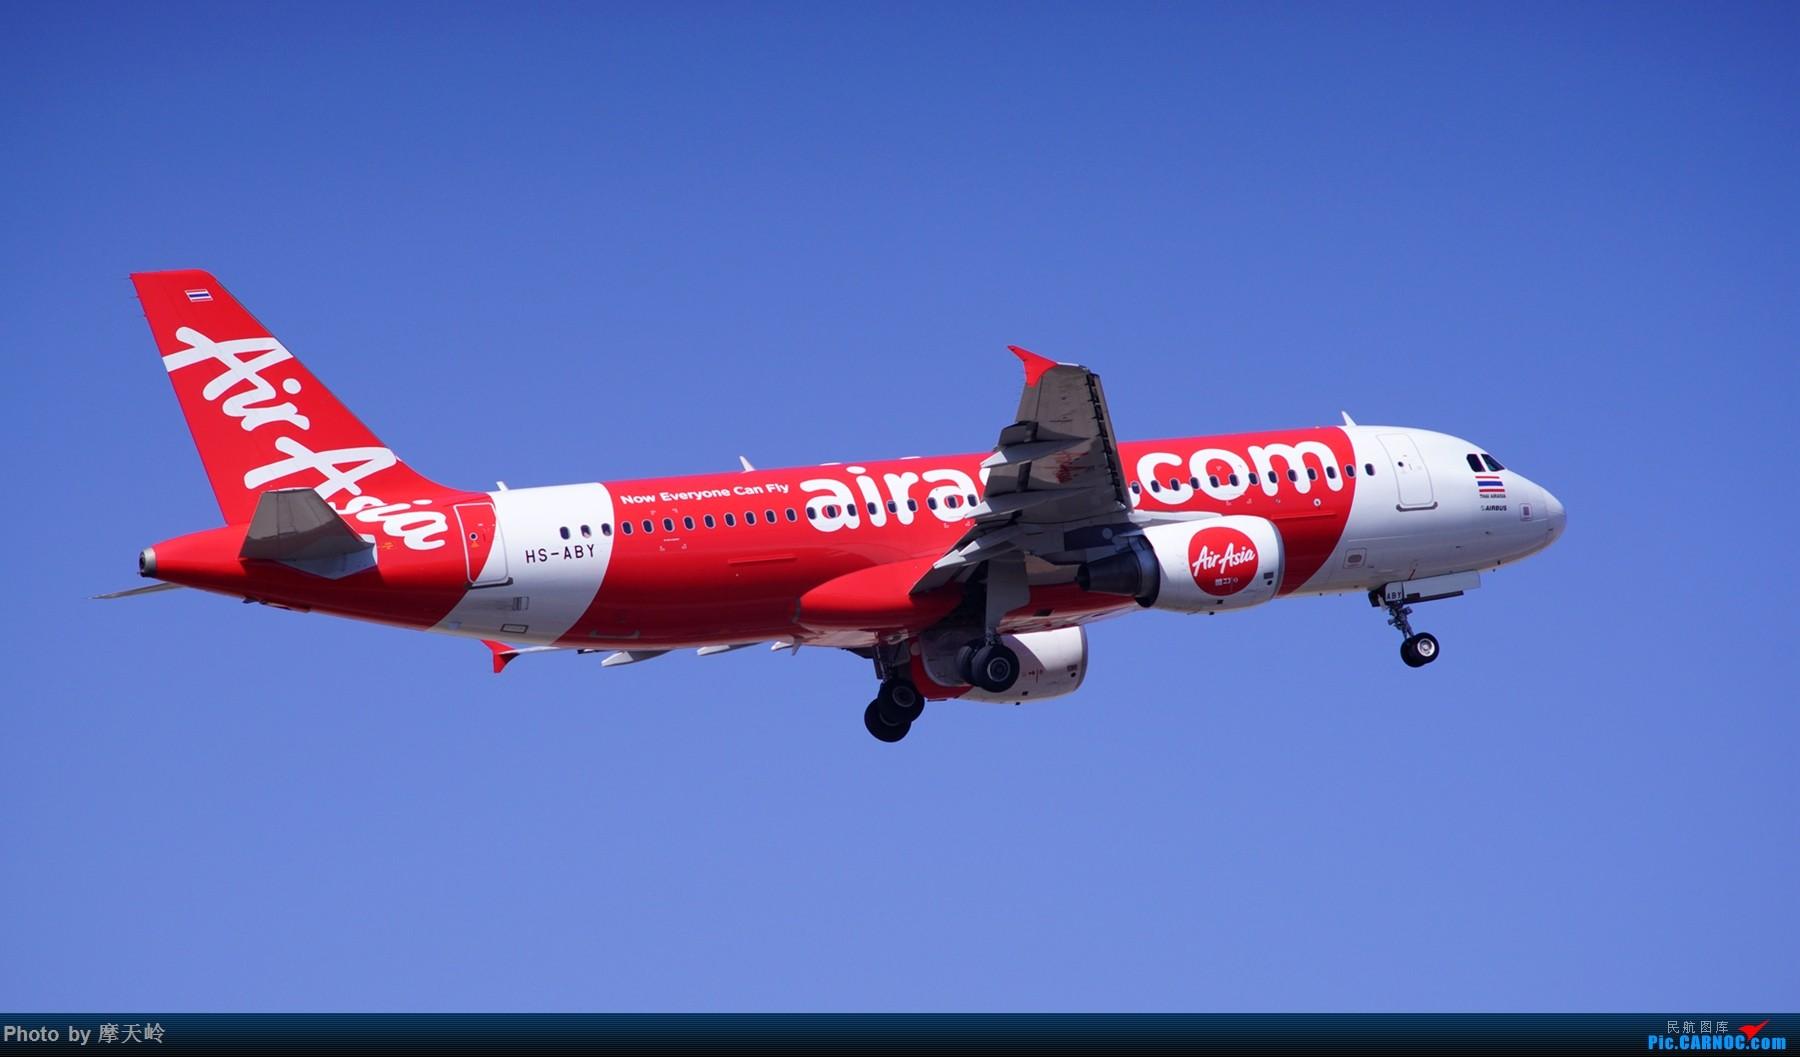 Re:[原创]长水尽是小家伙 AIRBUS A320-200 HS-ABY